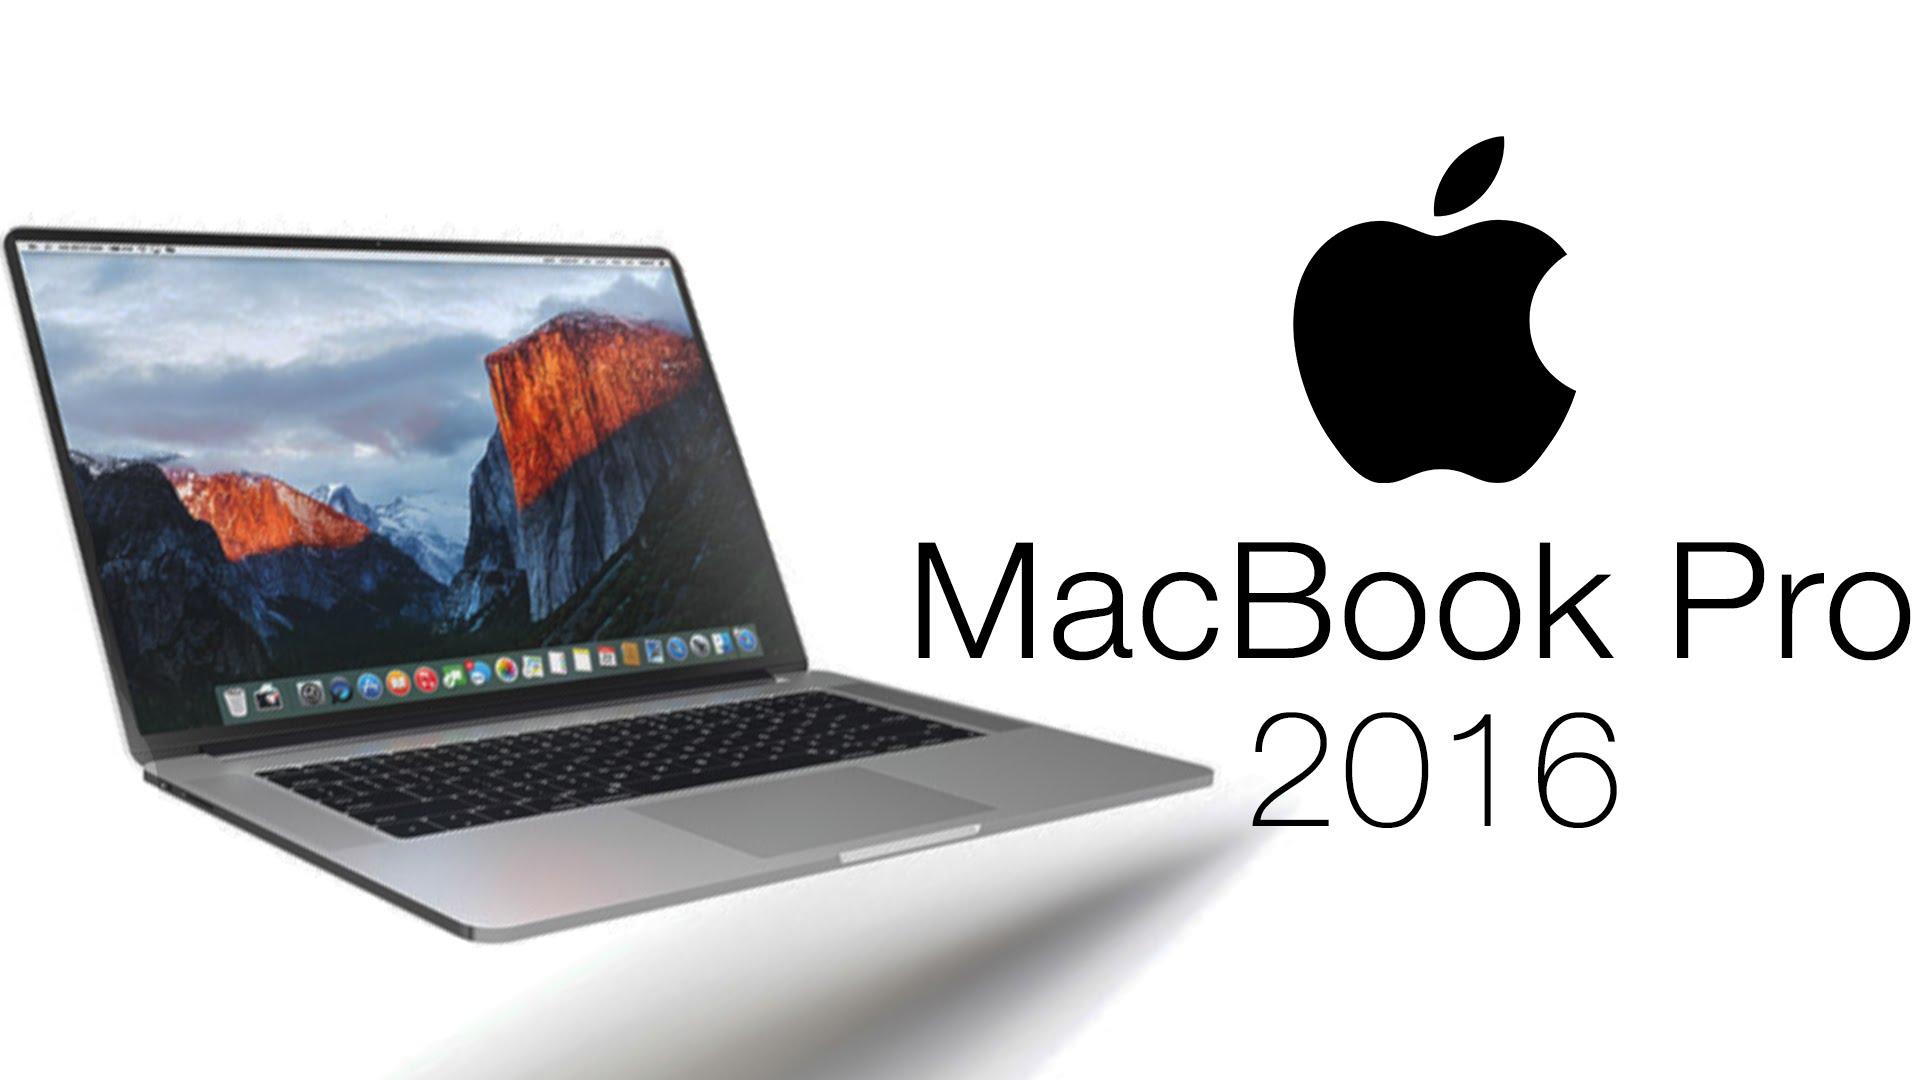 http://www.theapplelounge.com/wp-content/uploads/2016/09/MacBook-Pro-2016.jpg